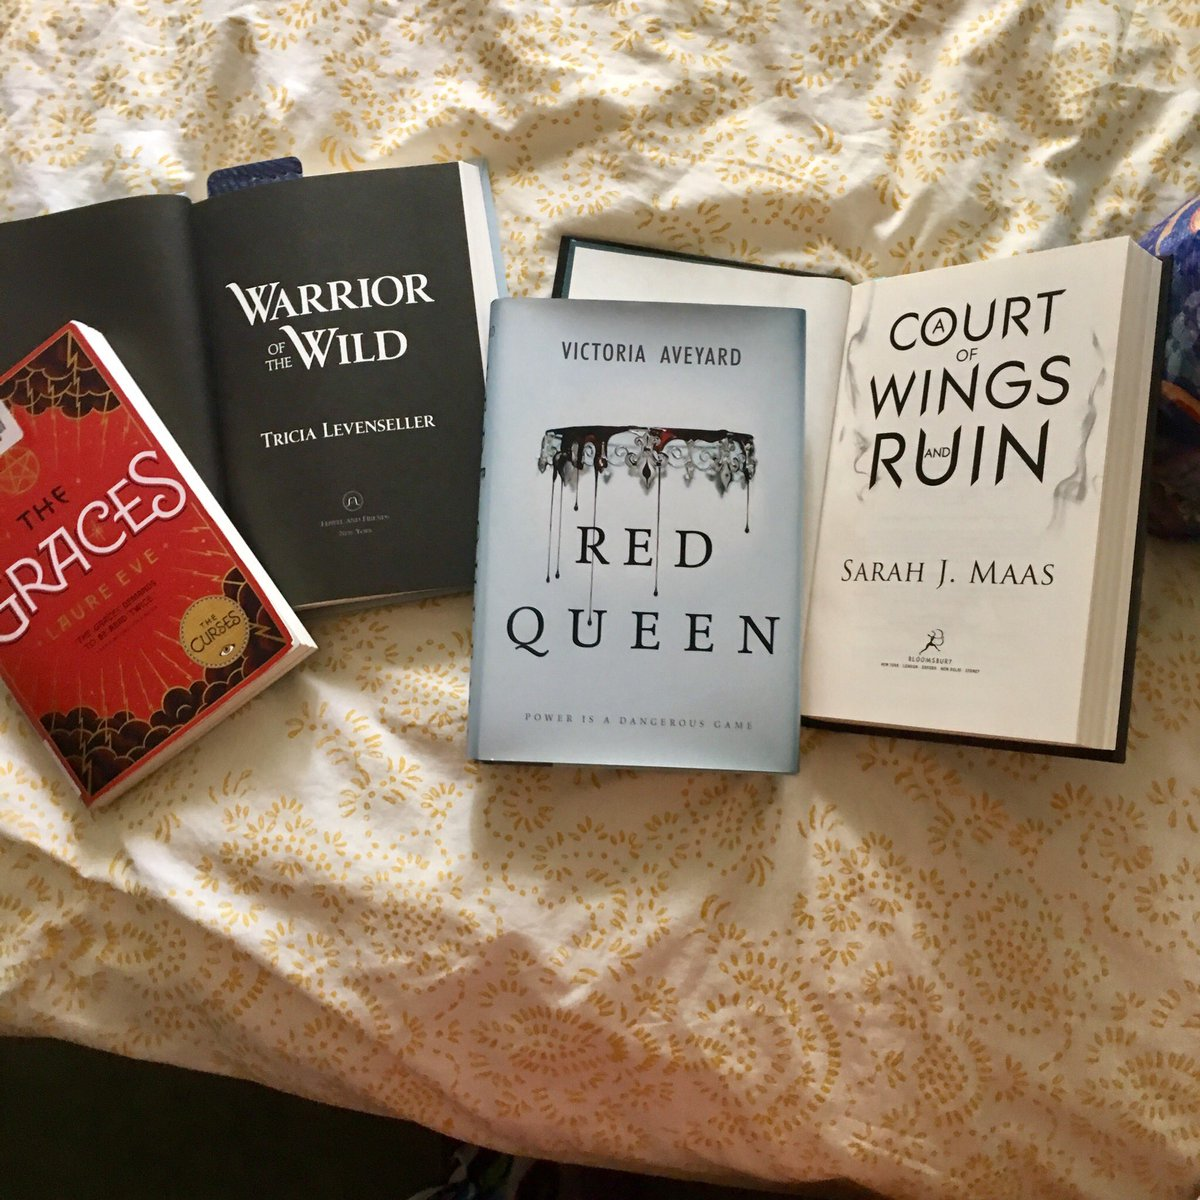 I cannot deciiiiide   #books #thegraces #laureeve #warriorofthewild #tricialevenseller #redqueen #victoriaaveyard #acourtofwingsandruin #sarahjmaas <br>http://pic.twitter.com/Xh6RrPe5V2